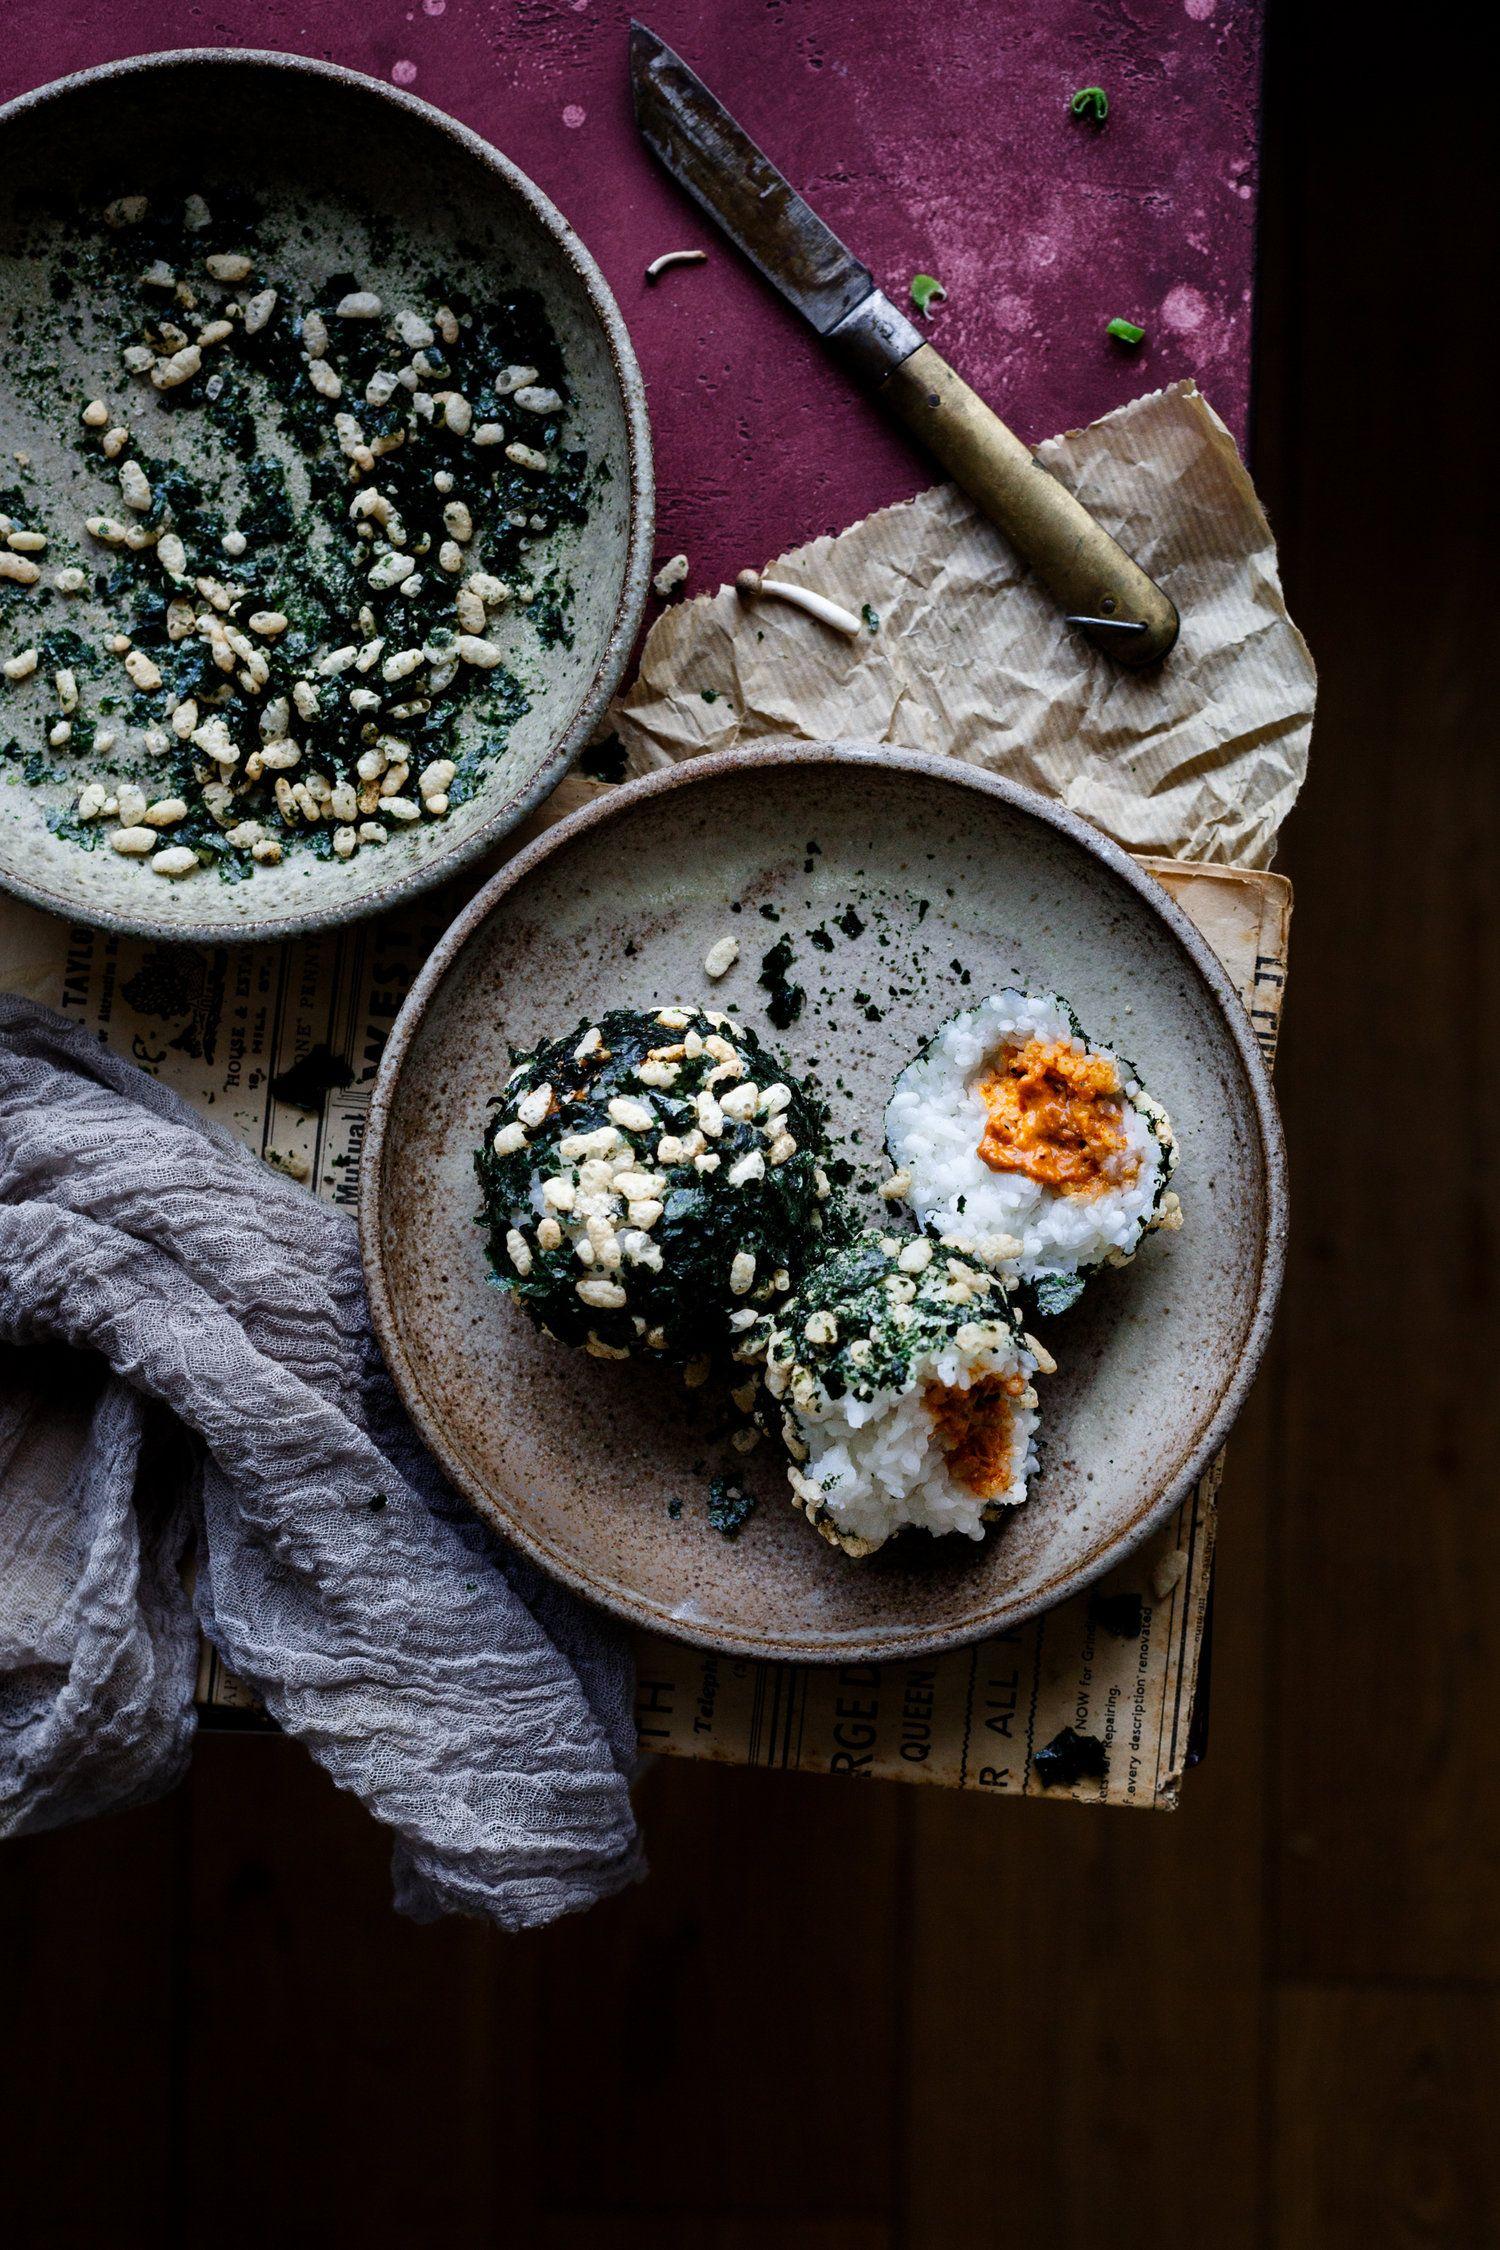 How To Make Filled Vegan Rice Balls A Vegan Food Photography An Vegan Food Photography Cookbook Giveaway Vegan Rice